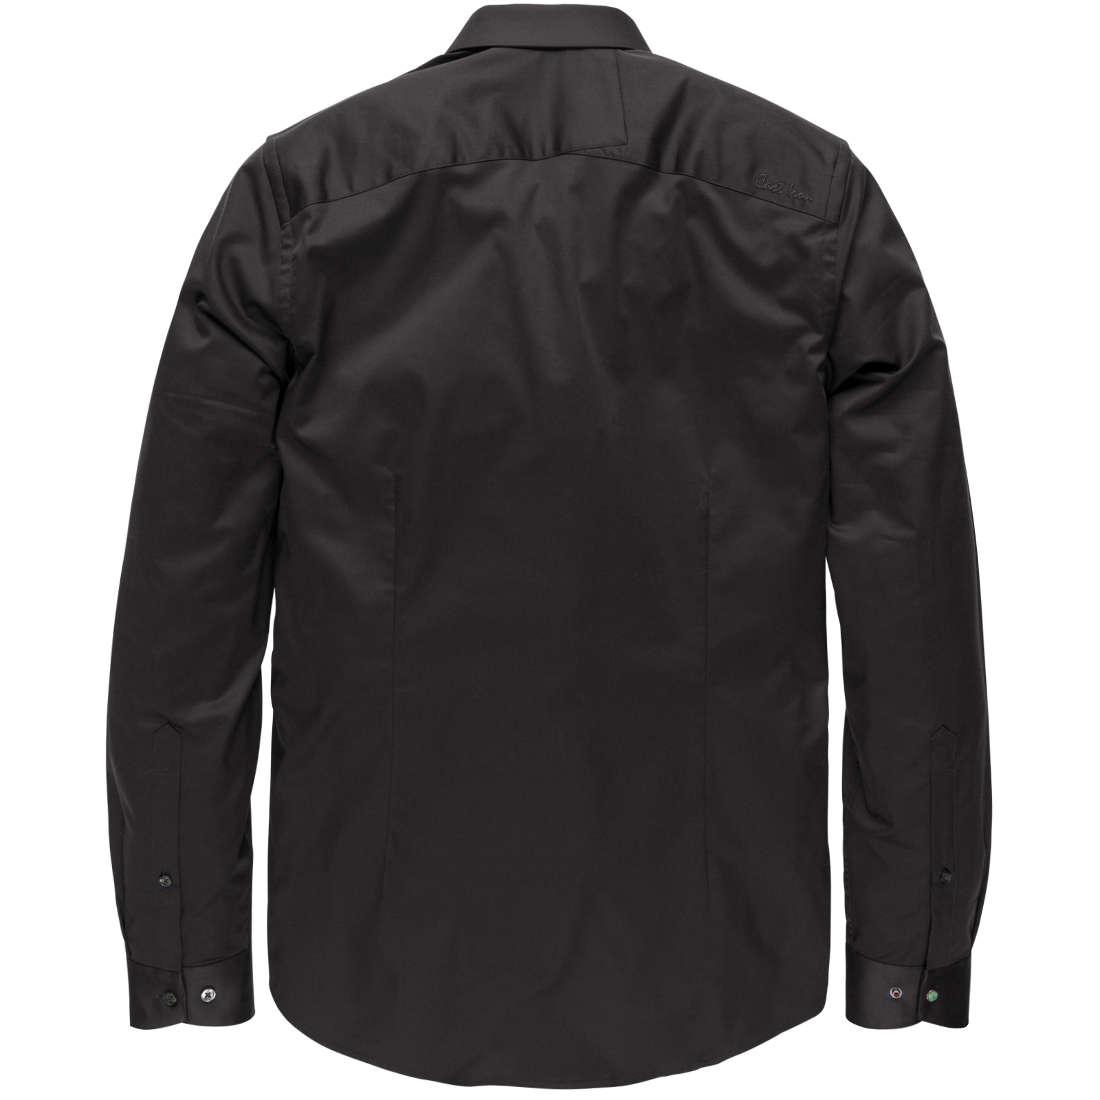 Overhemd Zwart Slim Fit.Cast Iron Overhemd Slim Fit Csi00429 In Het Zwart